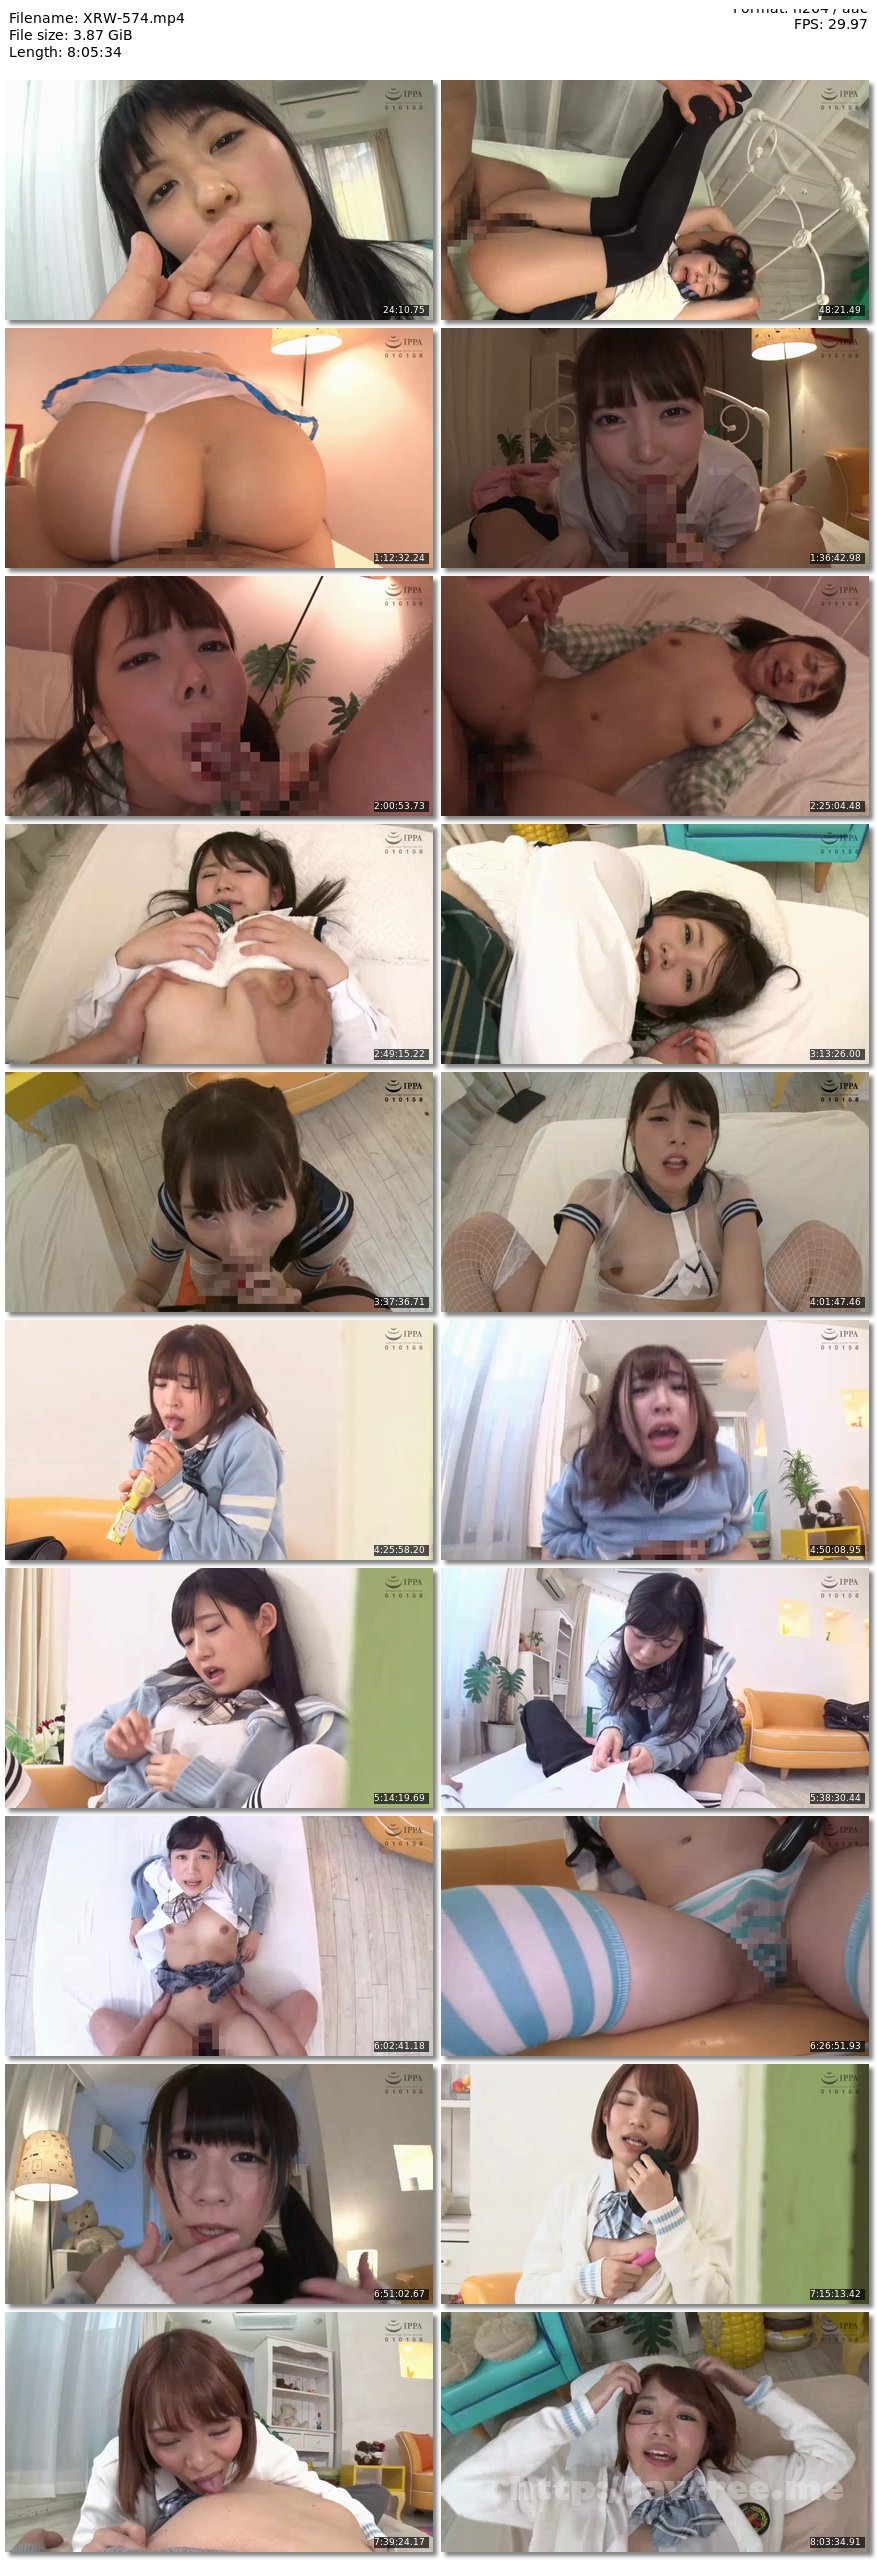 [XRW-574] イクイク早漏妹と排卵日子作り生活 Complete Memorial BEST 8時間DVD2枚組